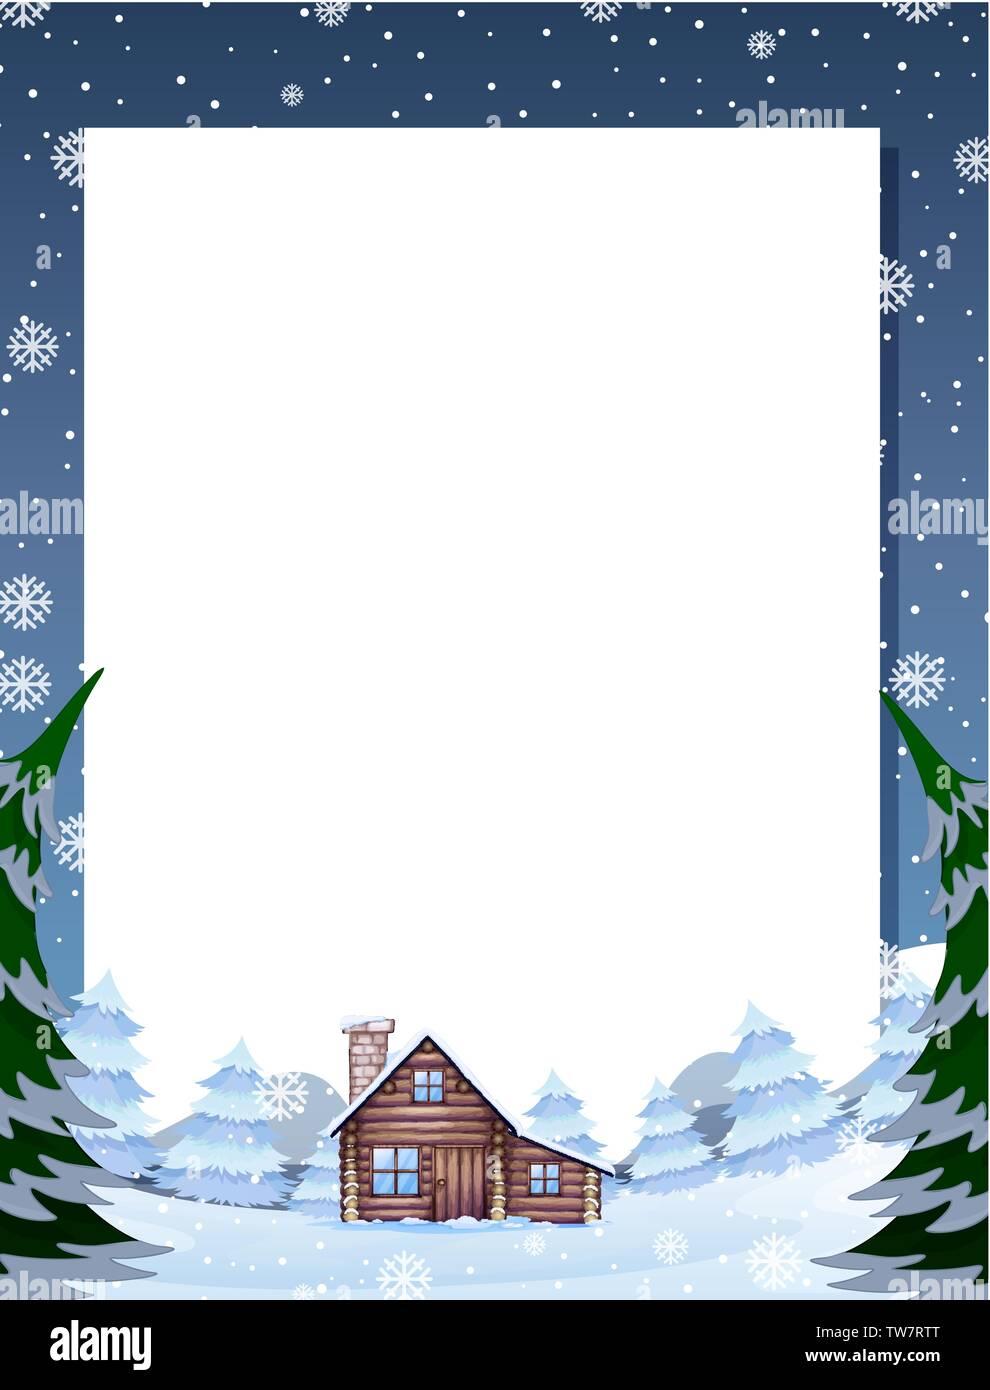 Winter cabin note template illustration - Stock Vector